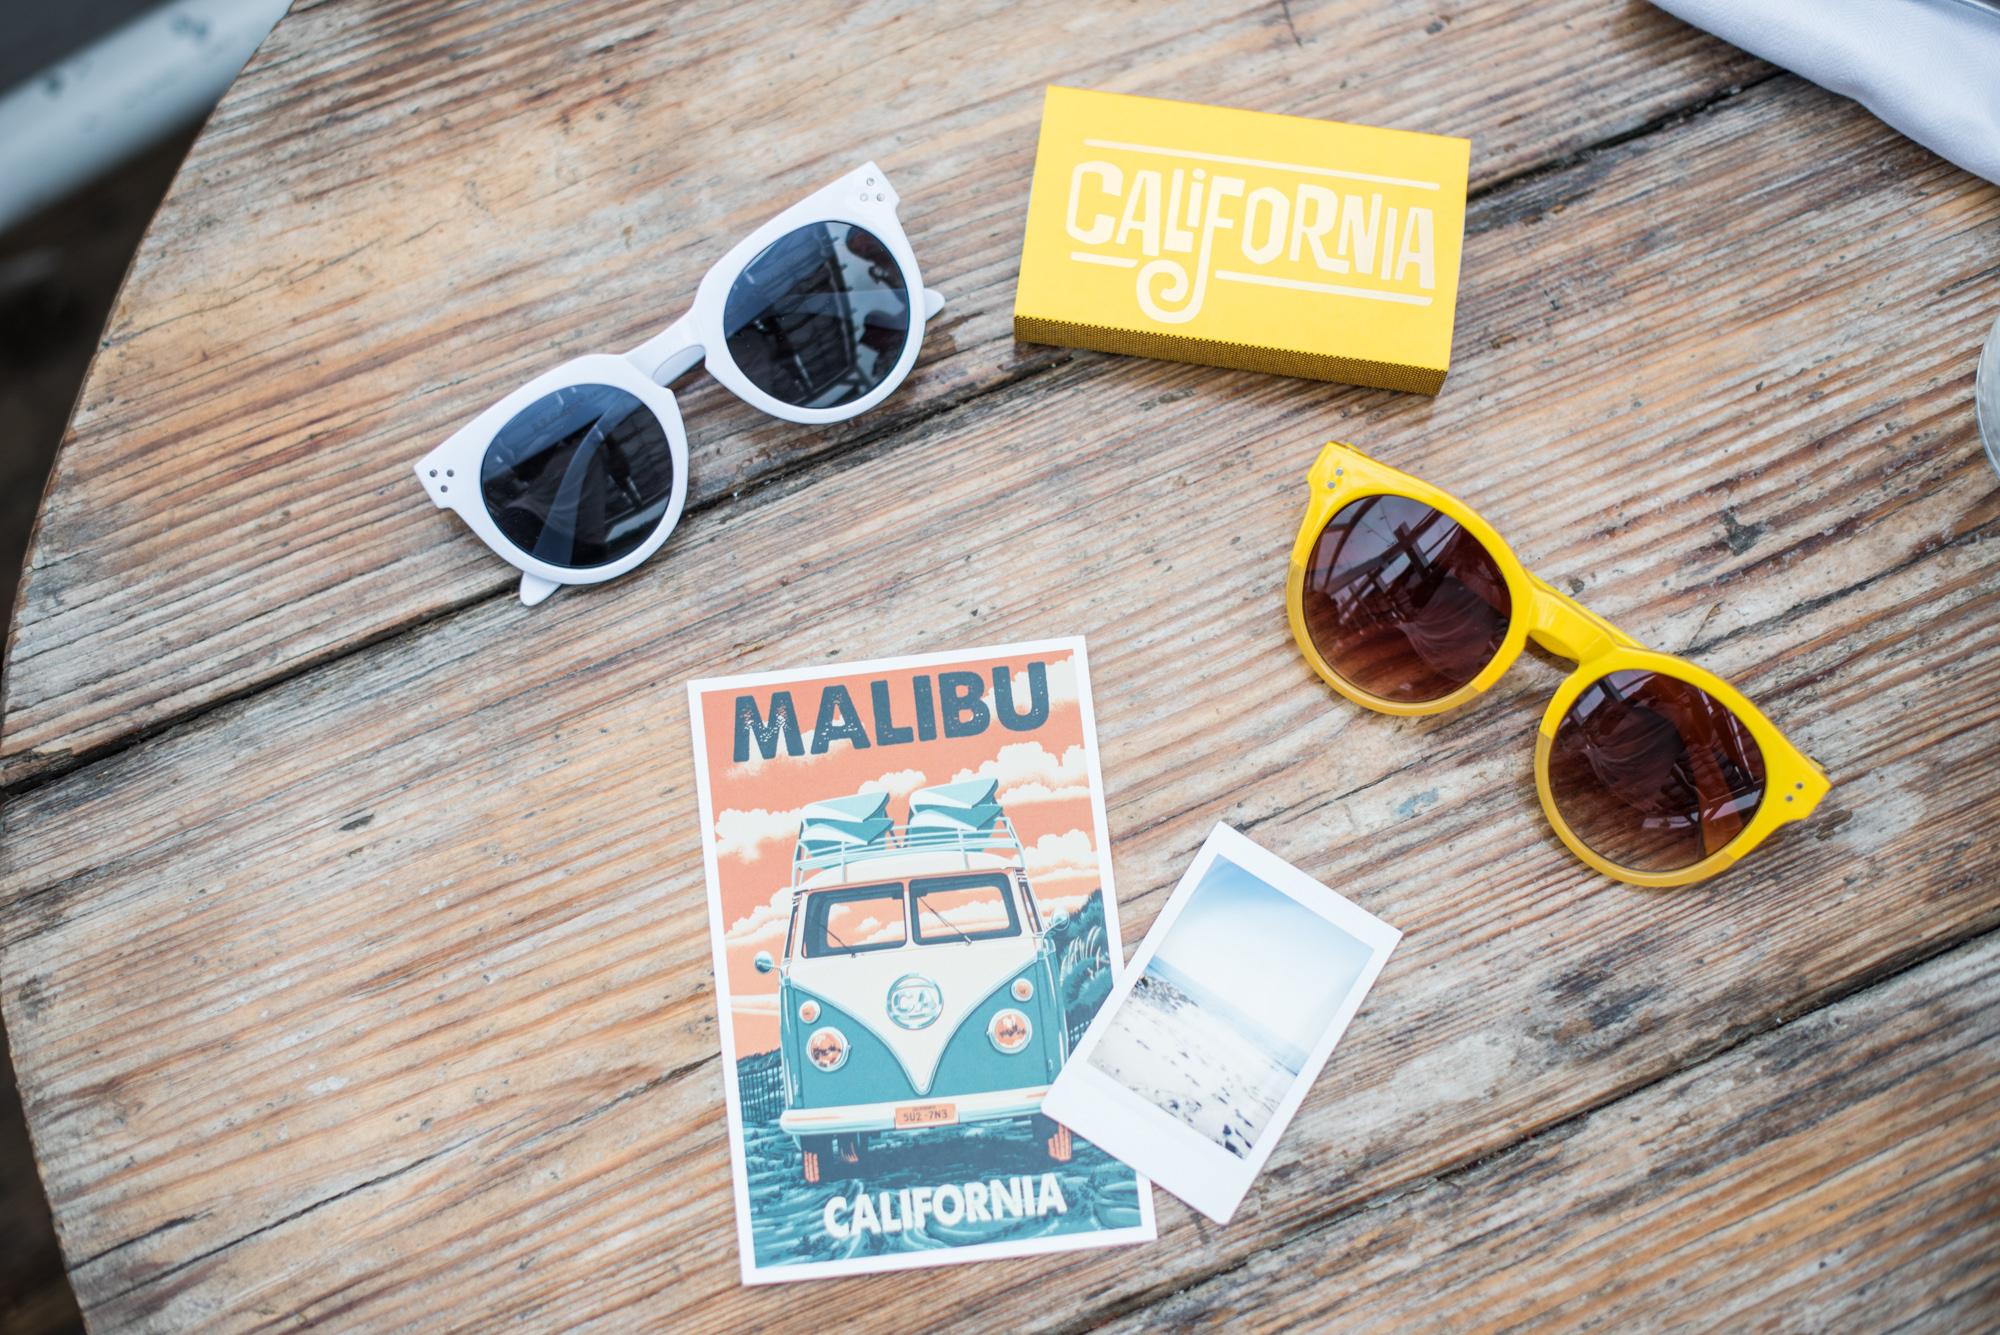 Summer sunglasses under $50